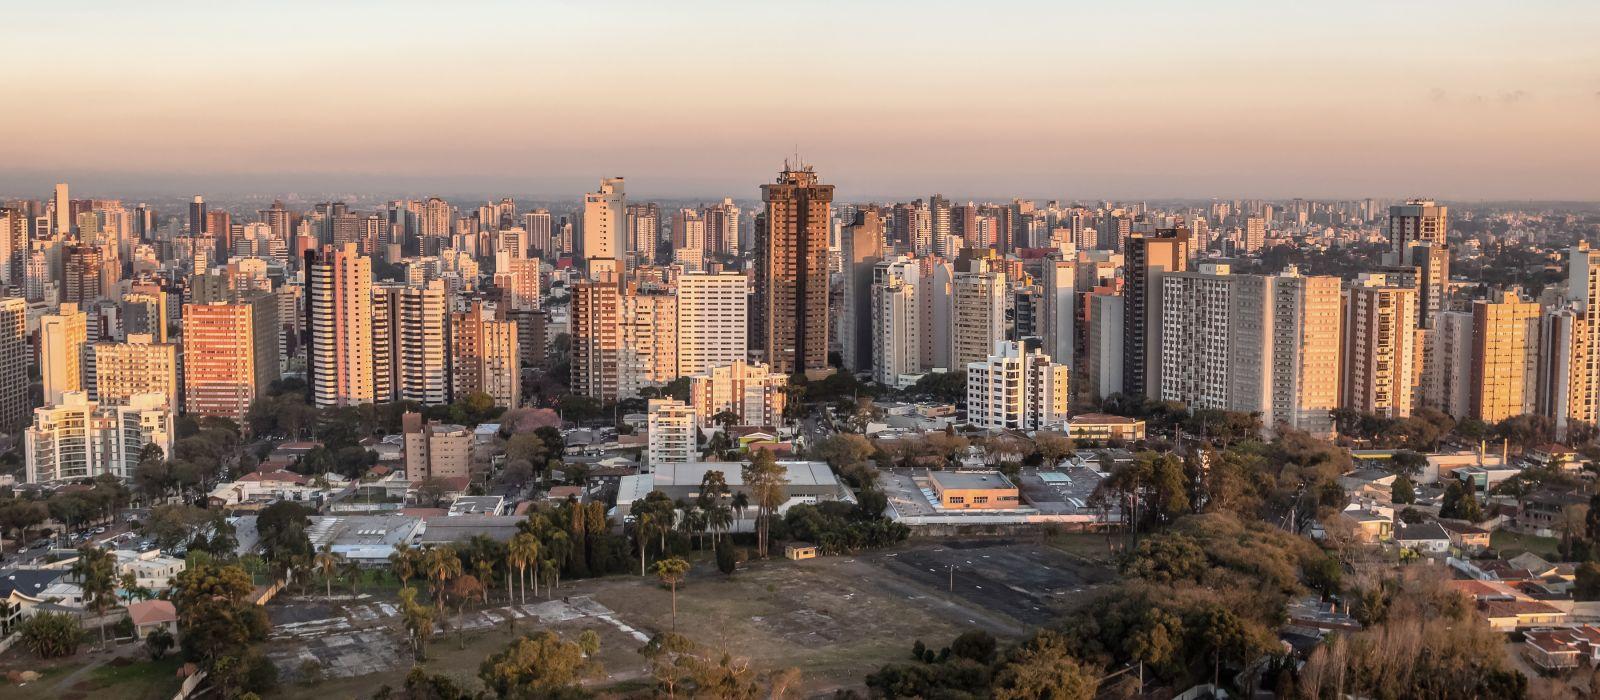 Aerial view of Curitiba City at sunset - Curitiba, Parana, Brazil, South America